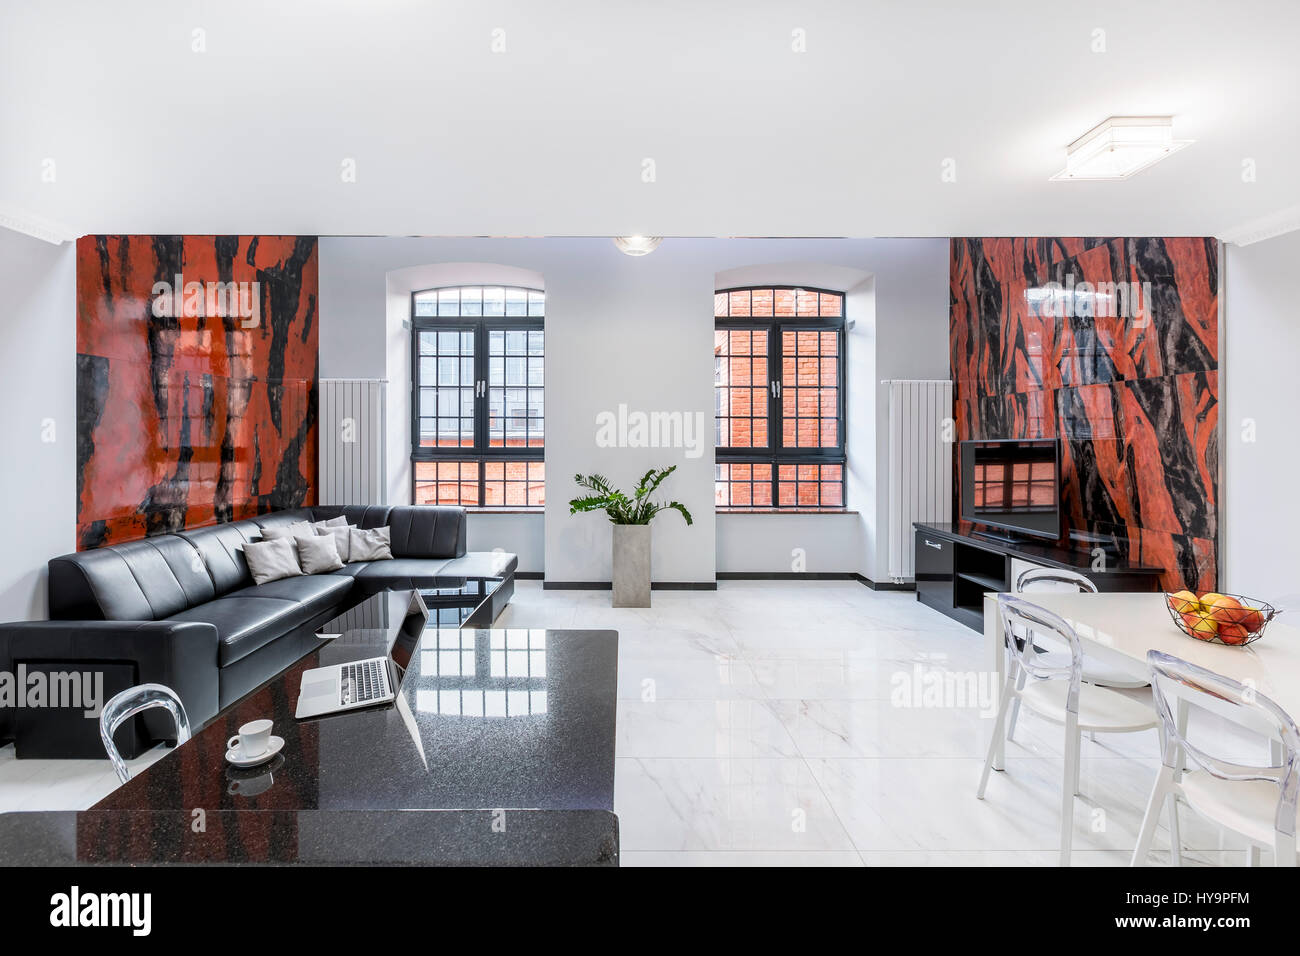 Groovy Luxury White Loft Apartment With Sofa Table Window Gloss Inzonedesignstudio Interior Chair Design Inzonedesignstudiocom